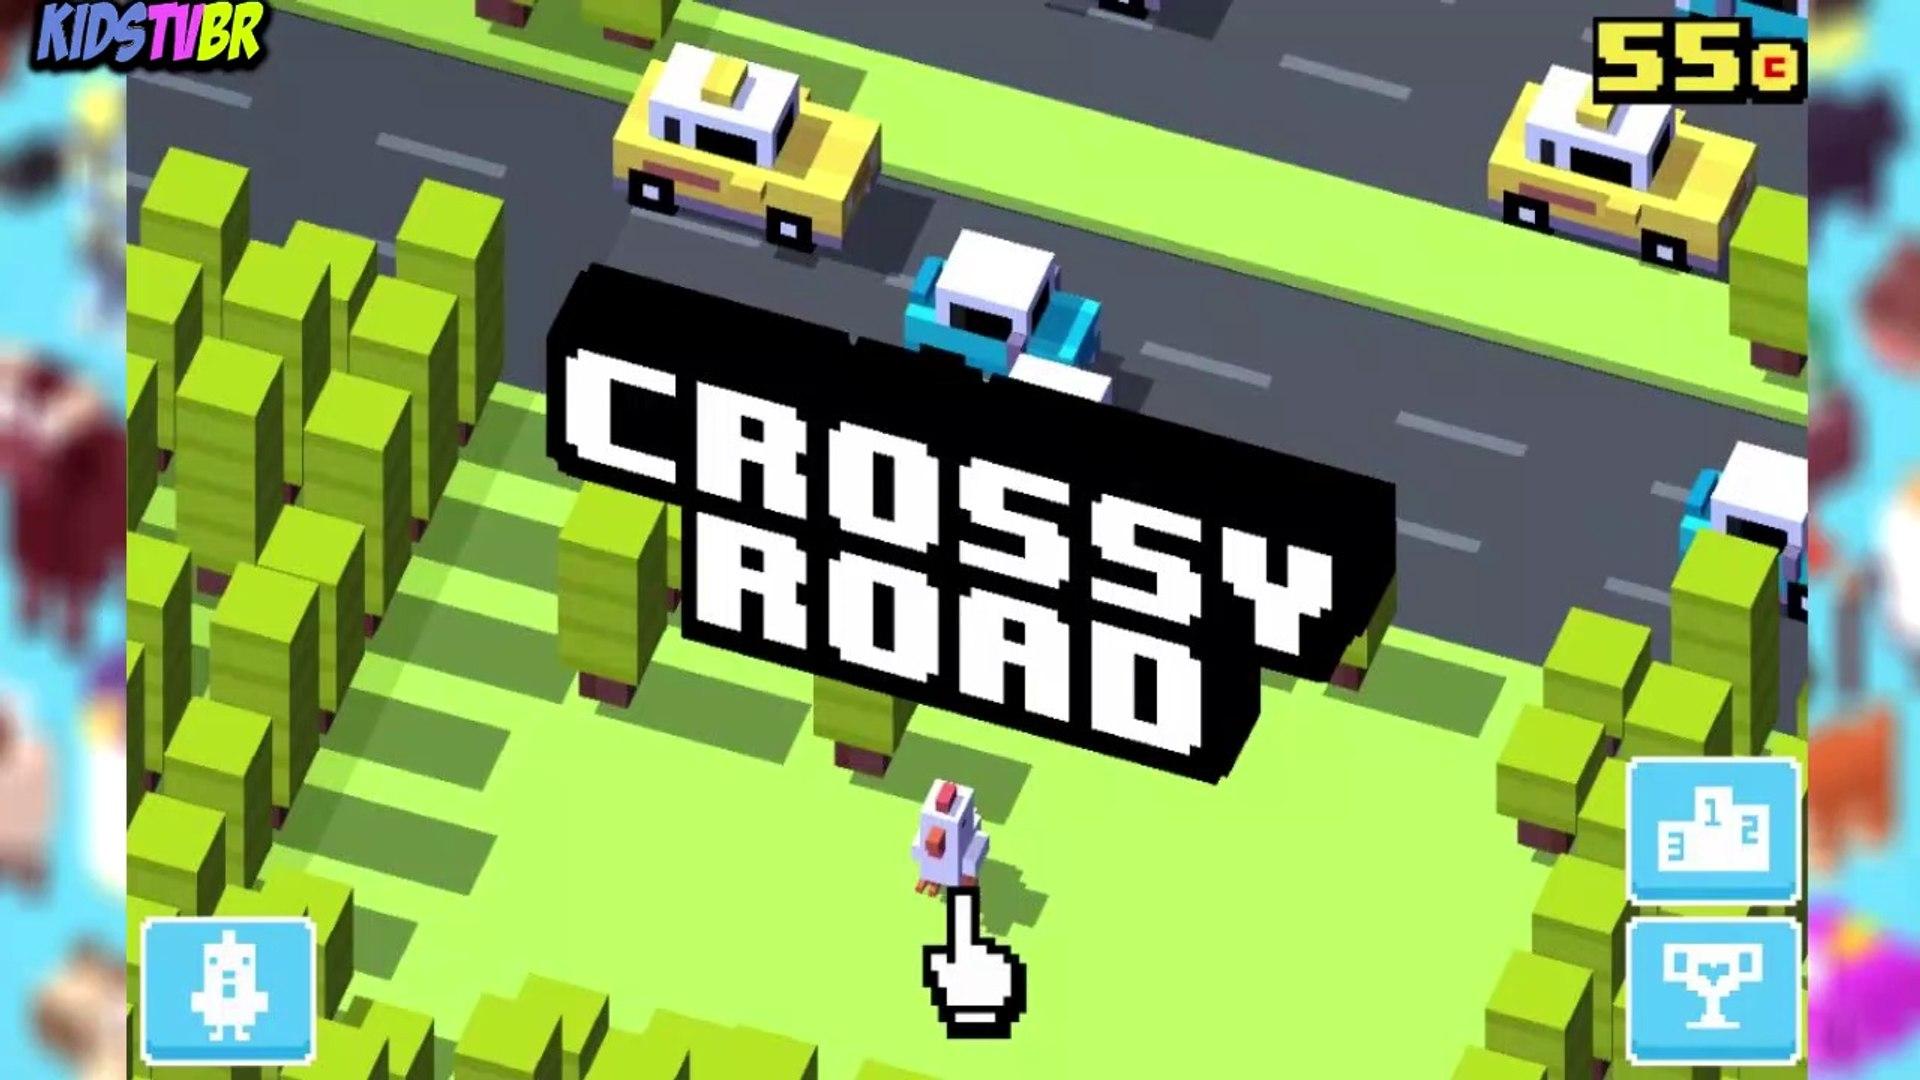 CROSSY ROAD  KIDS TV BR